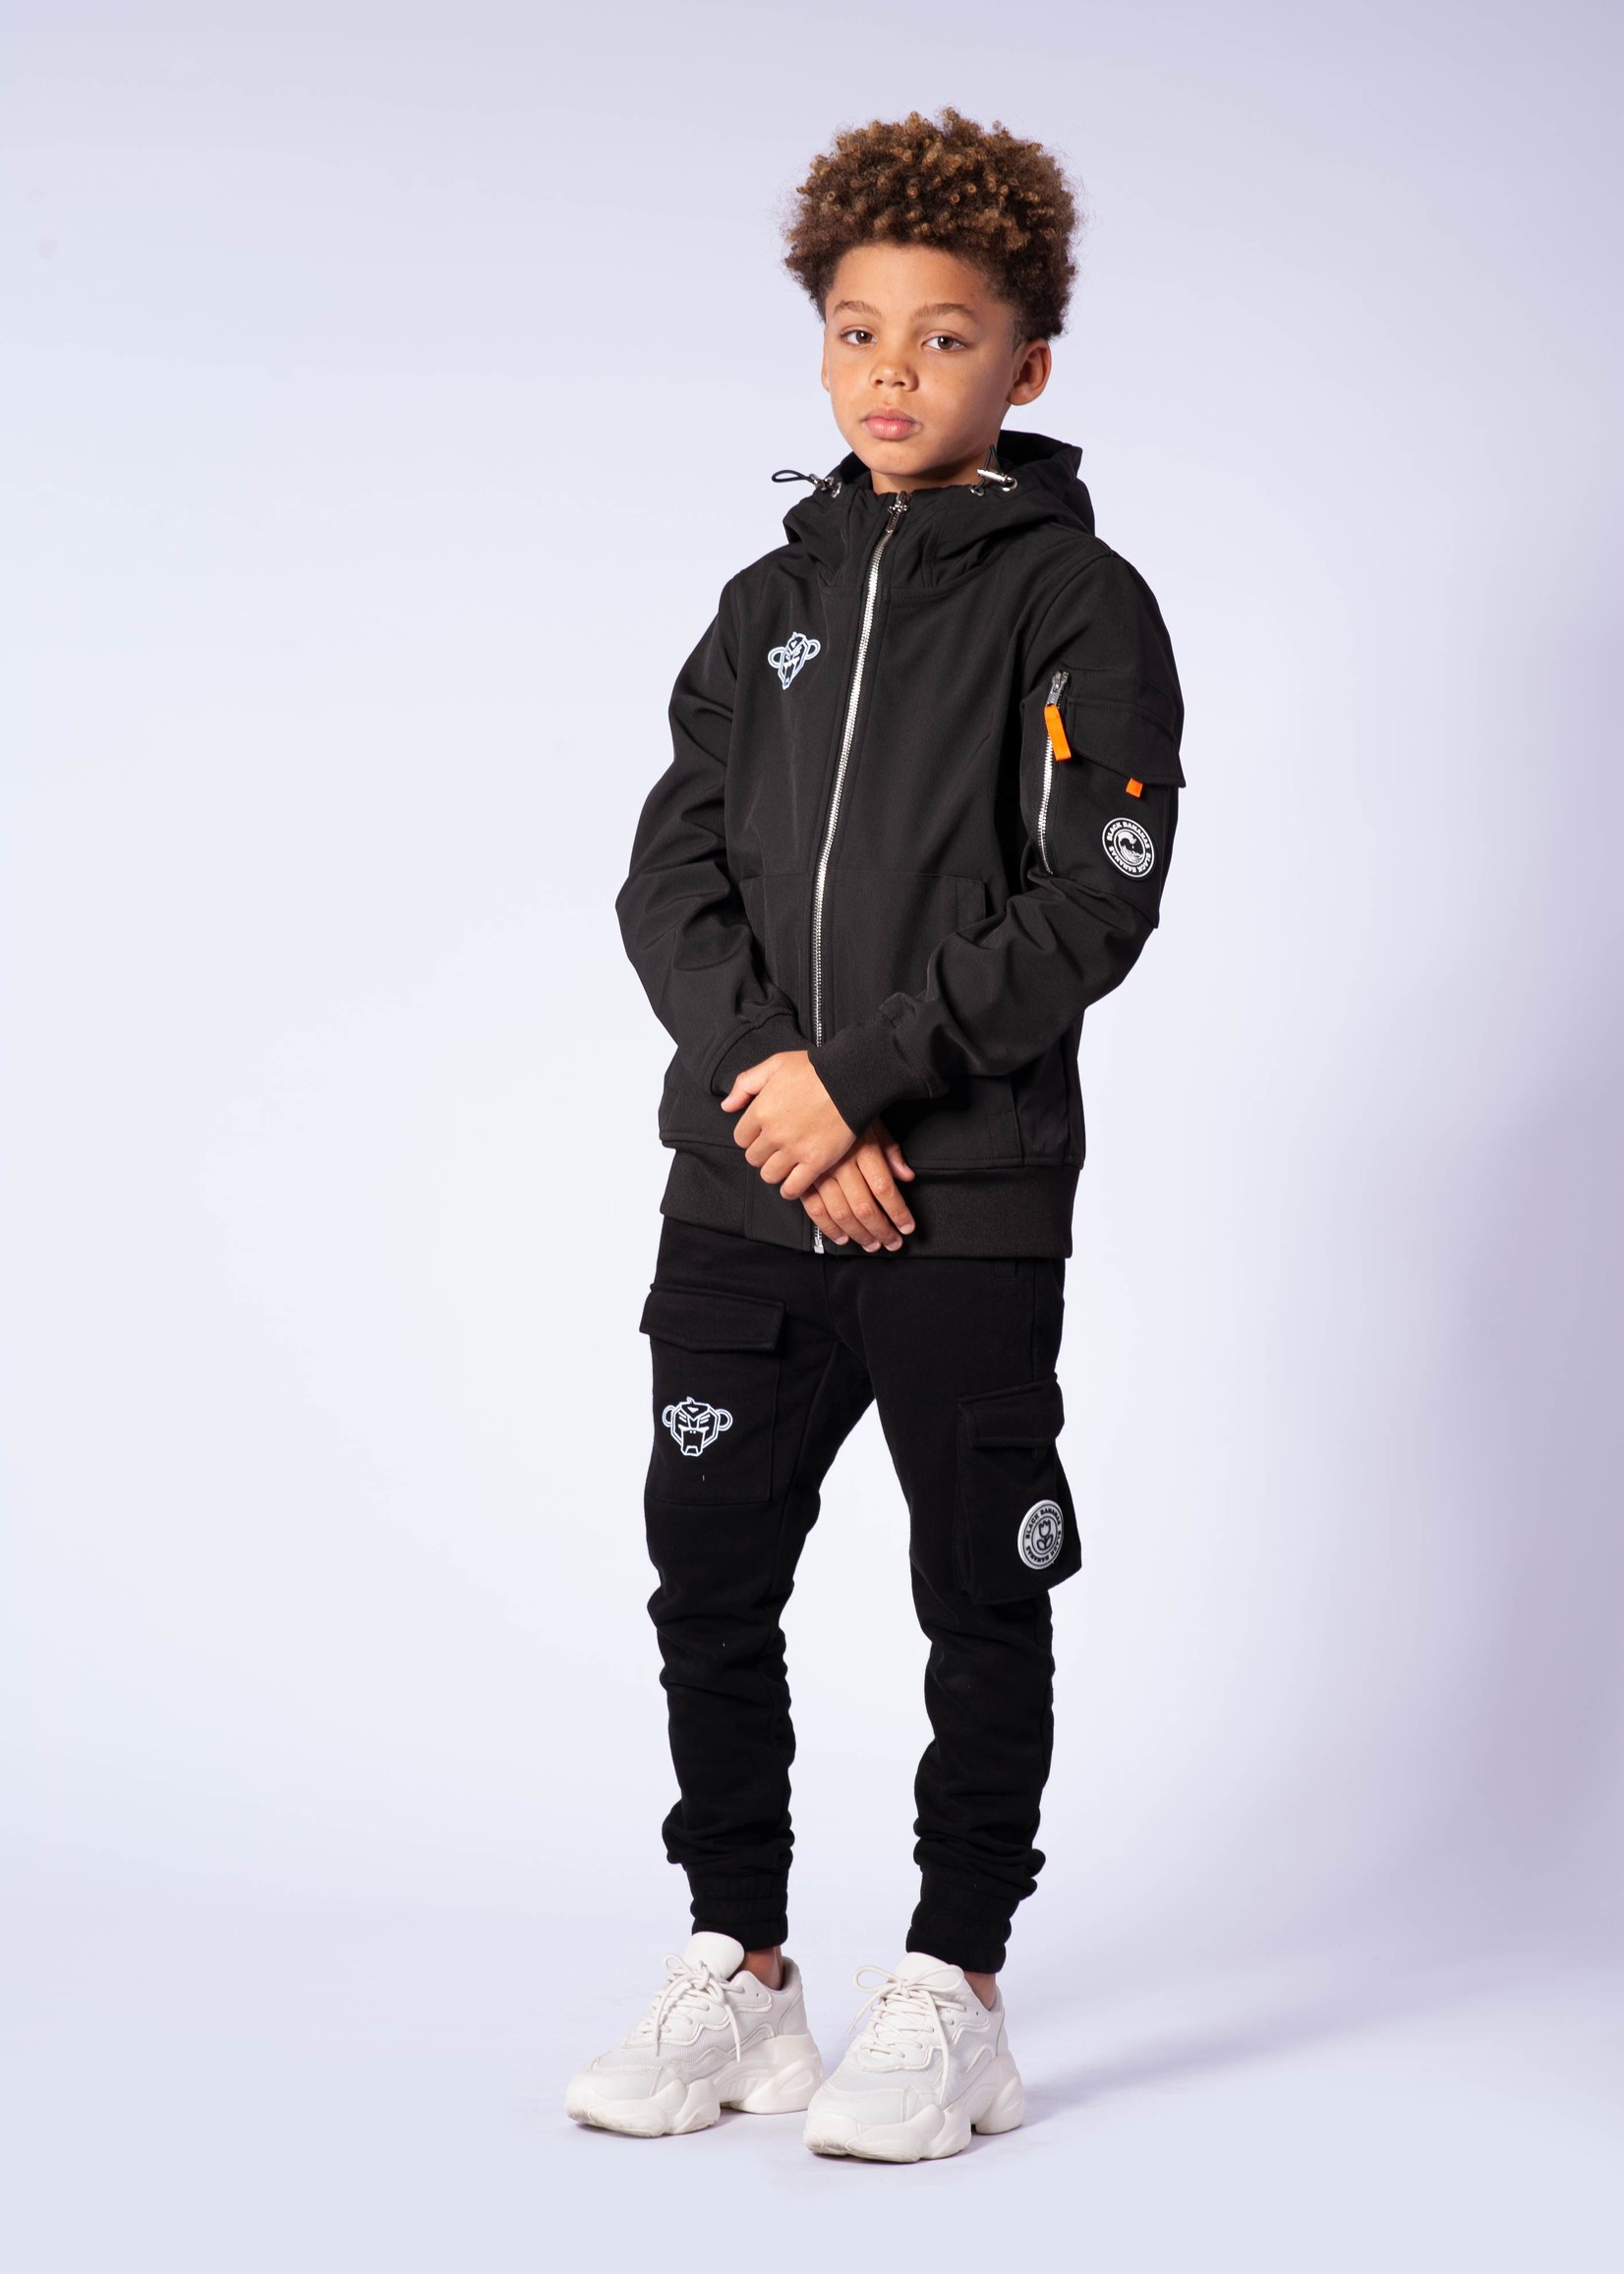 Black Bananas Jr Softshell Jacket